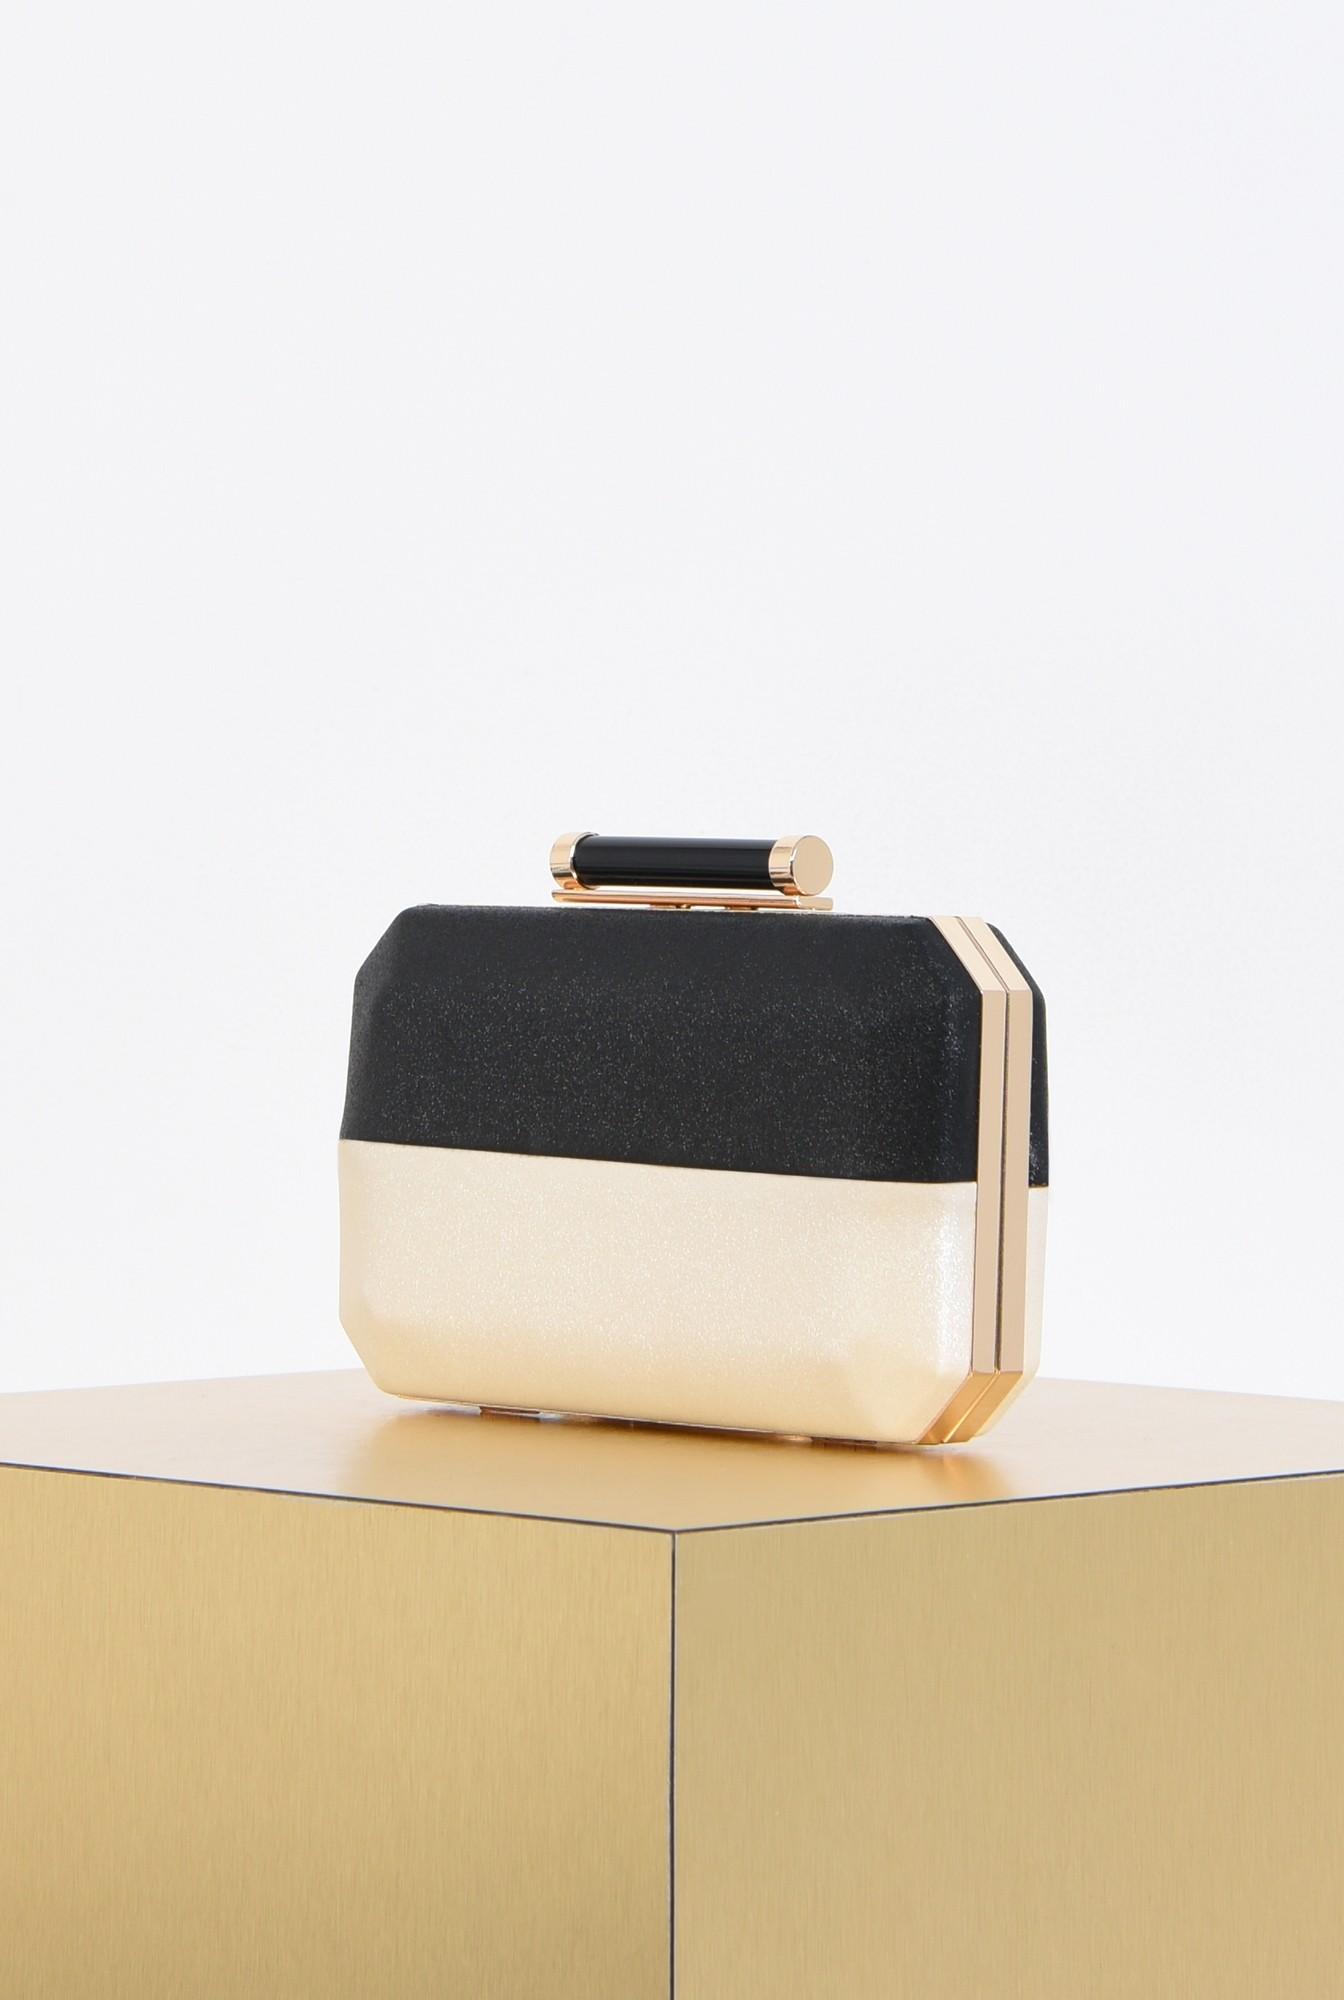 1 - poseta eleganta, clutch, bicolor, plic elegant